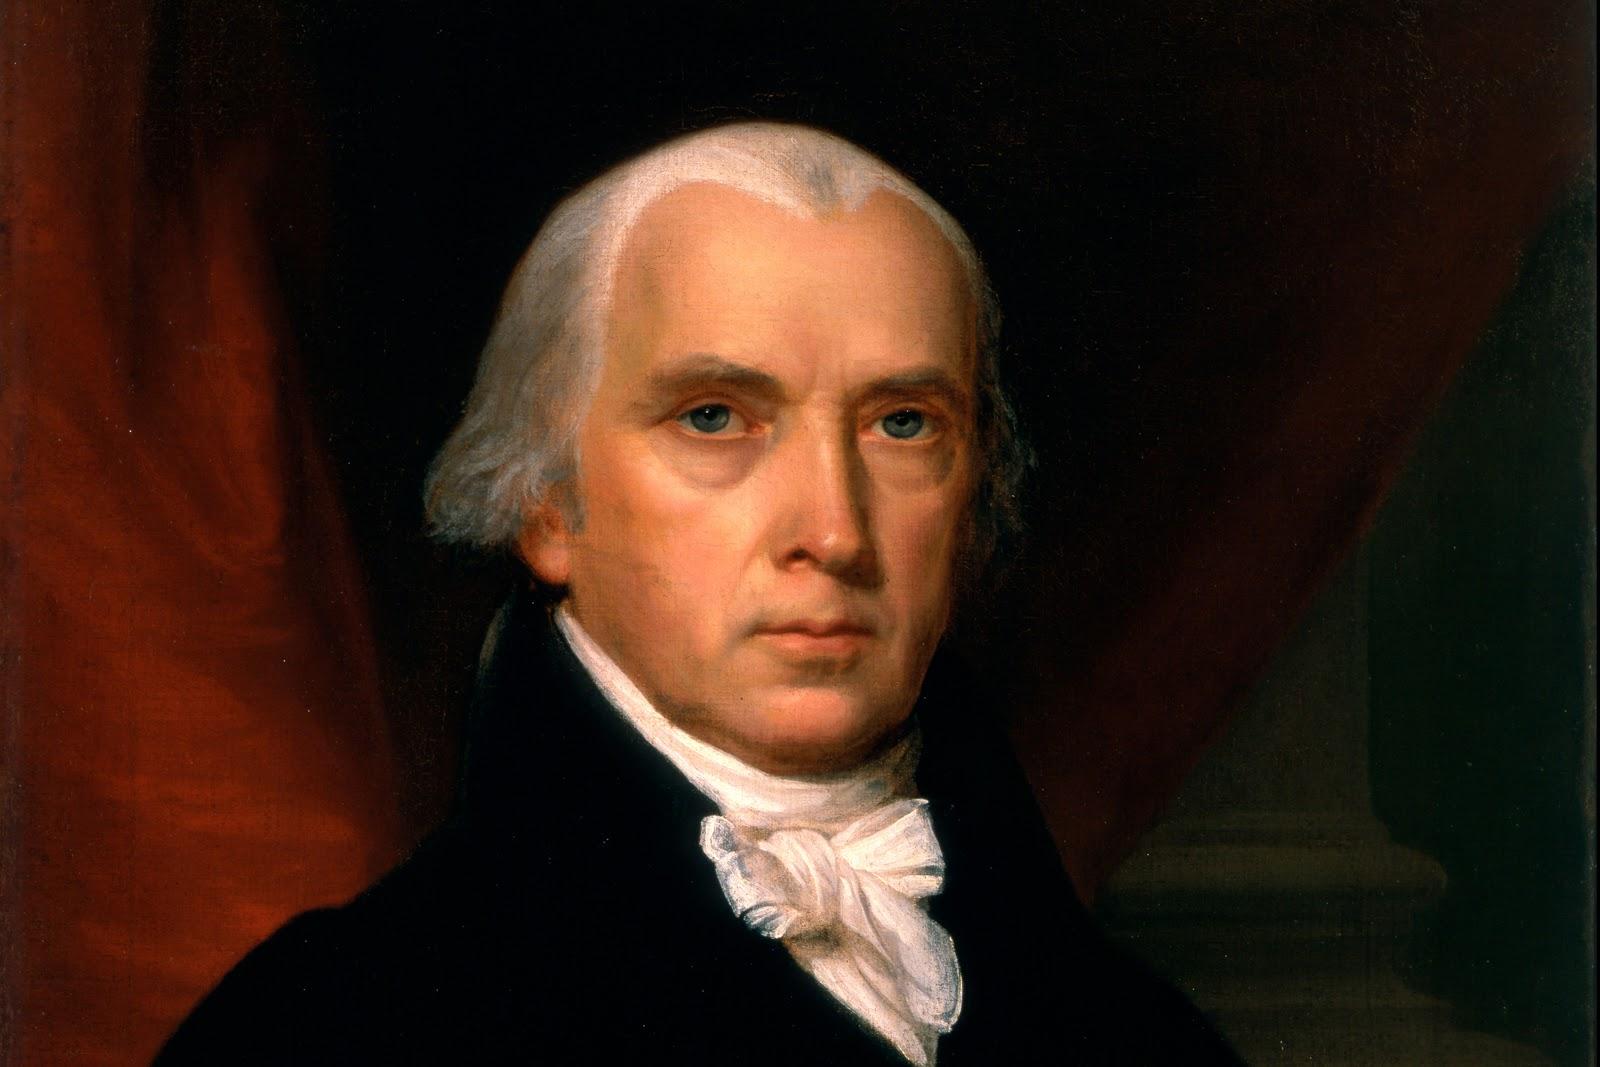 James Madison, portrait by John Vanderlyn